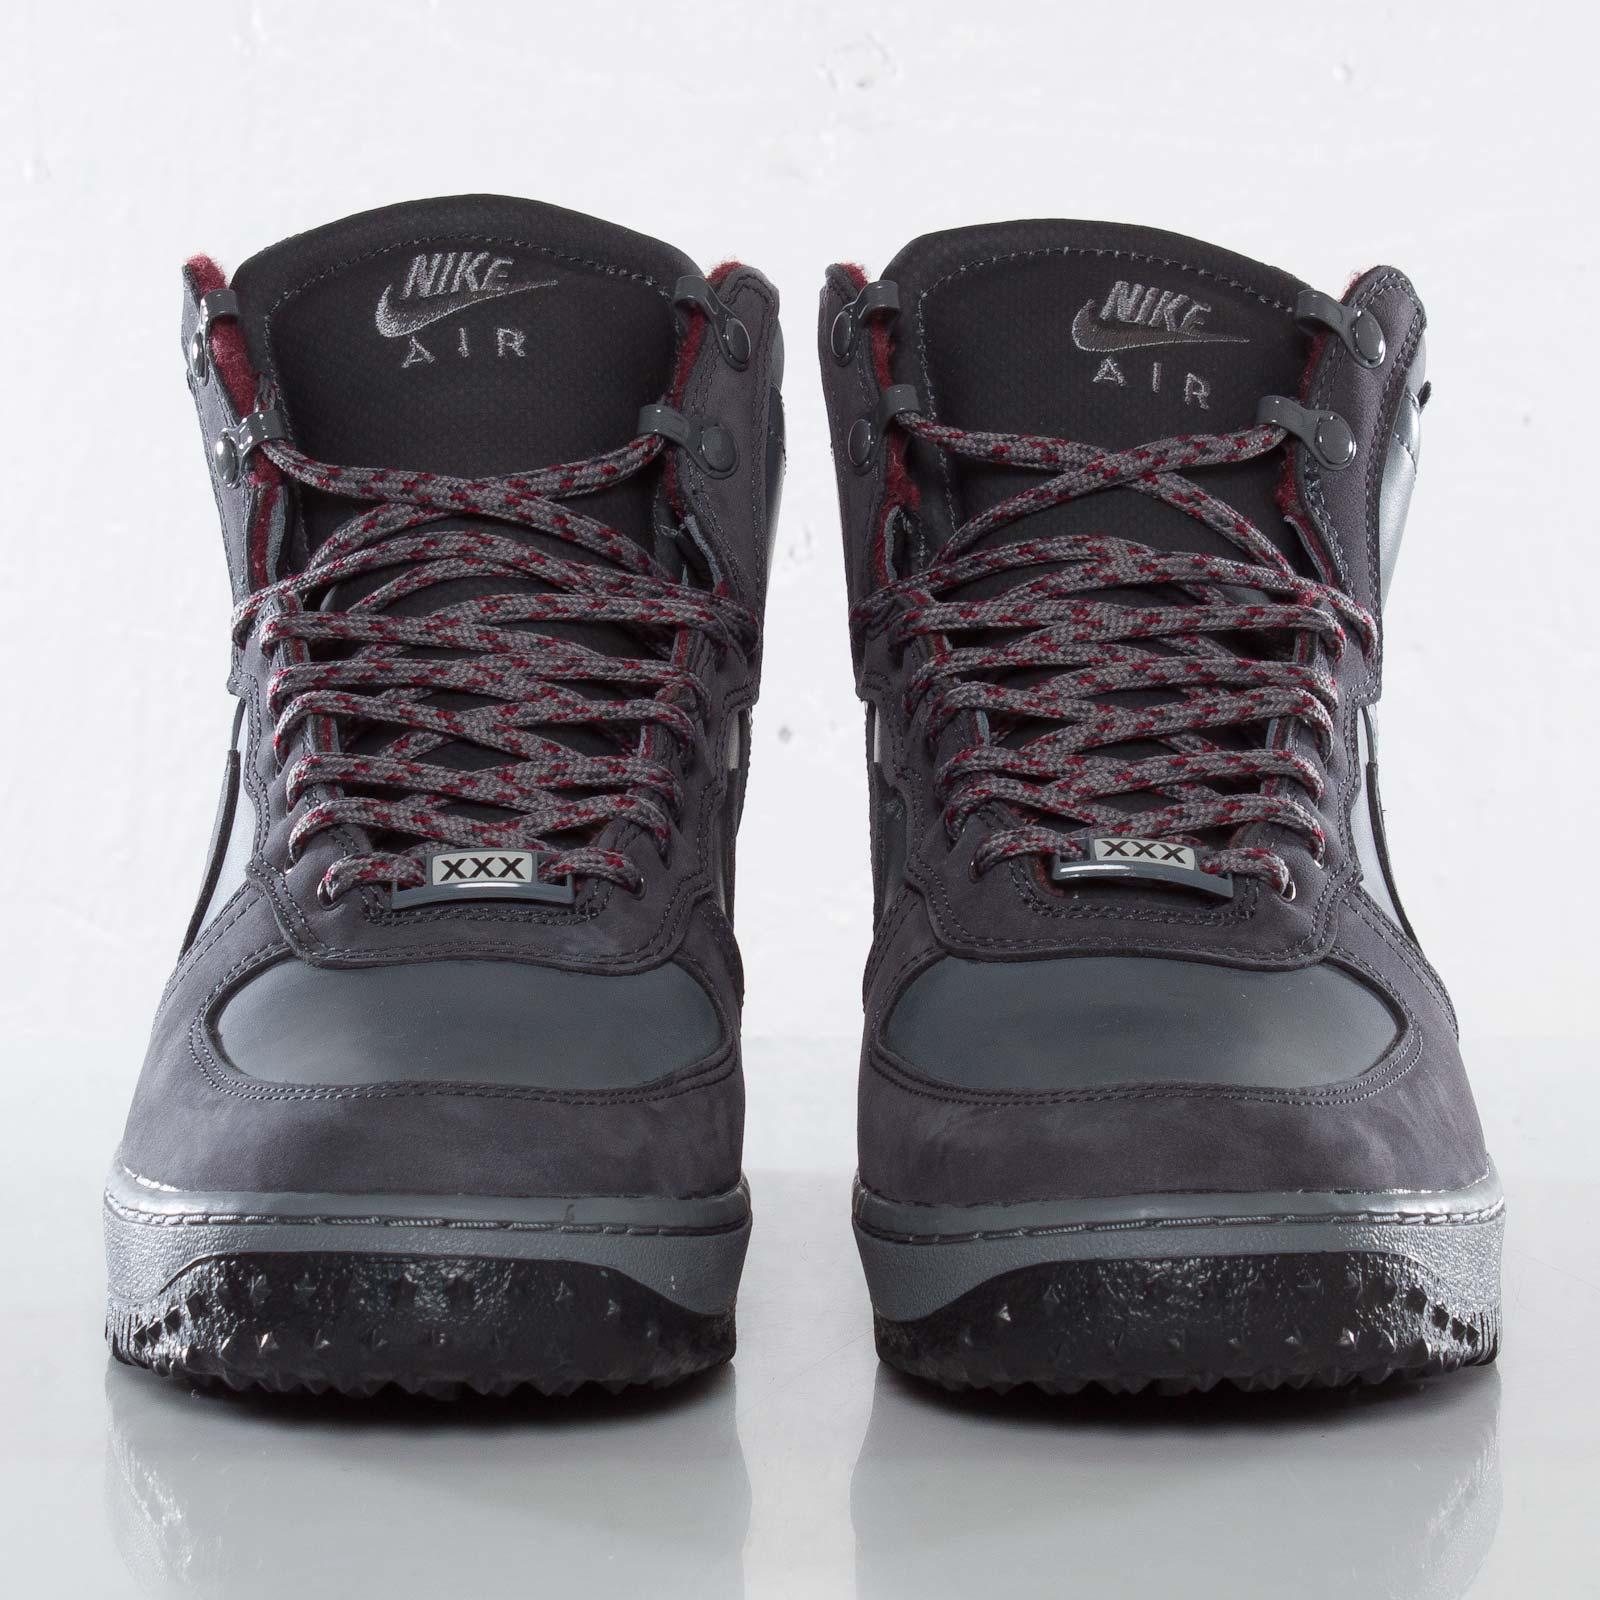 Air Mb Qs 573978 Deconstruct 001 Sneakersnstuff Nike Force 1 SVLpGqUzM